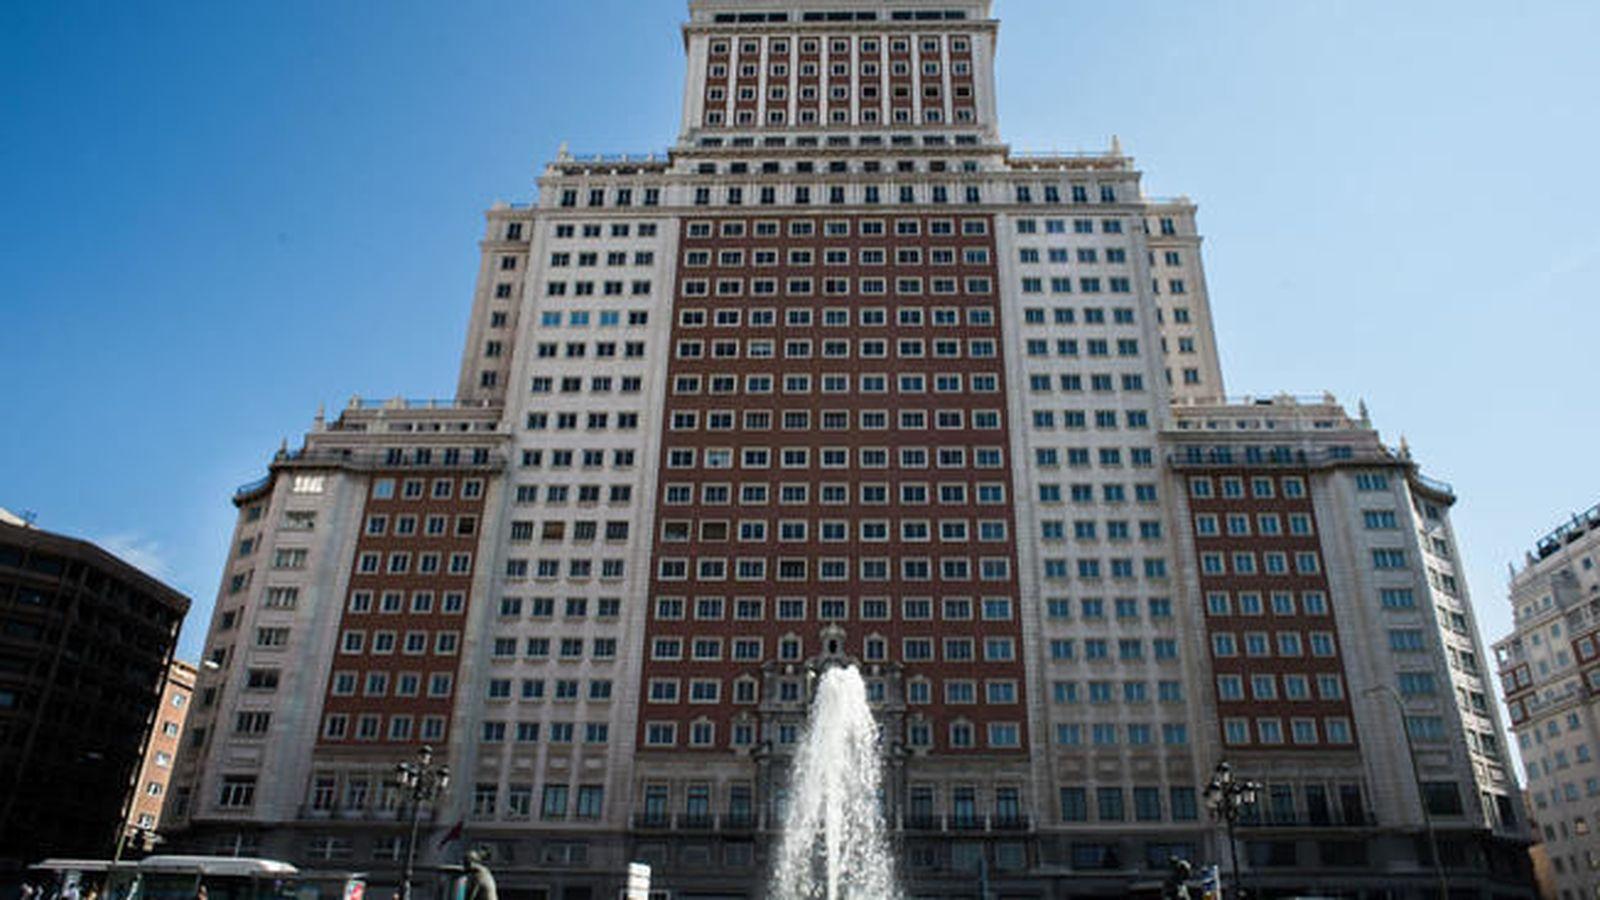 Foto: Edificio de la emblemática Plaza de España de Madrid. (Daniel Muñoz)